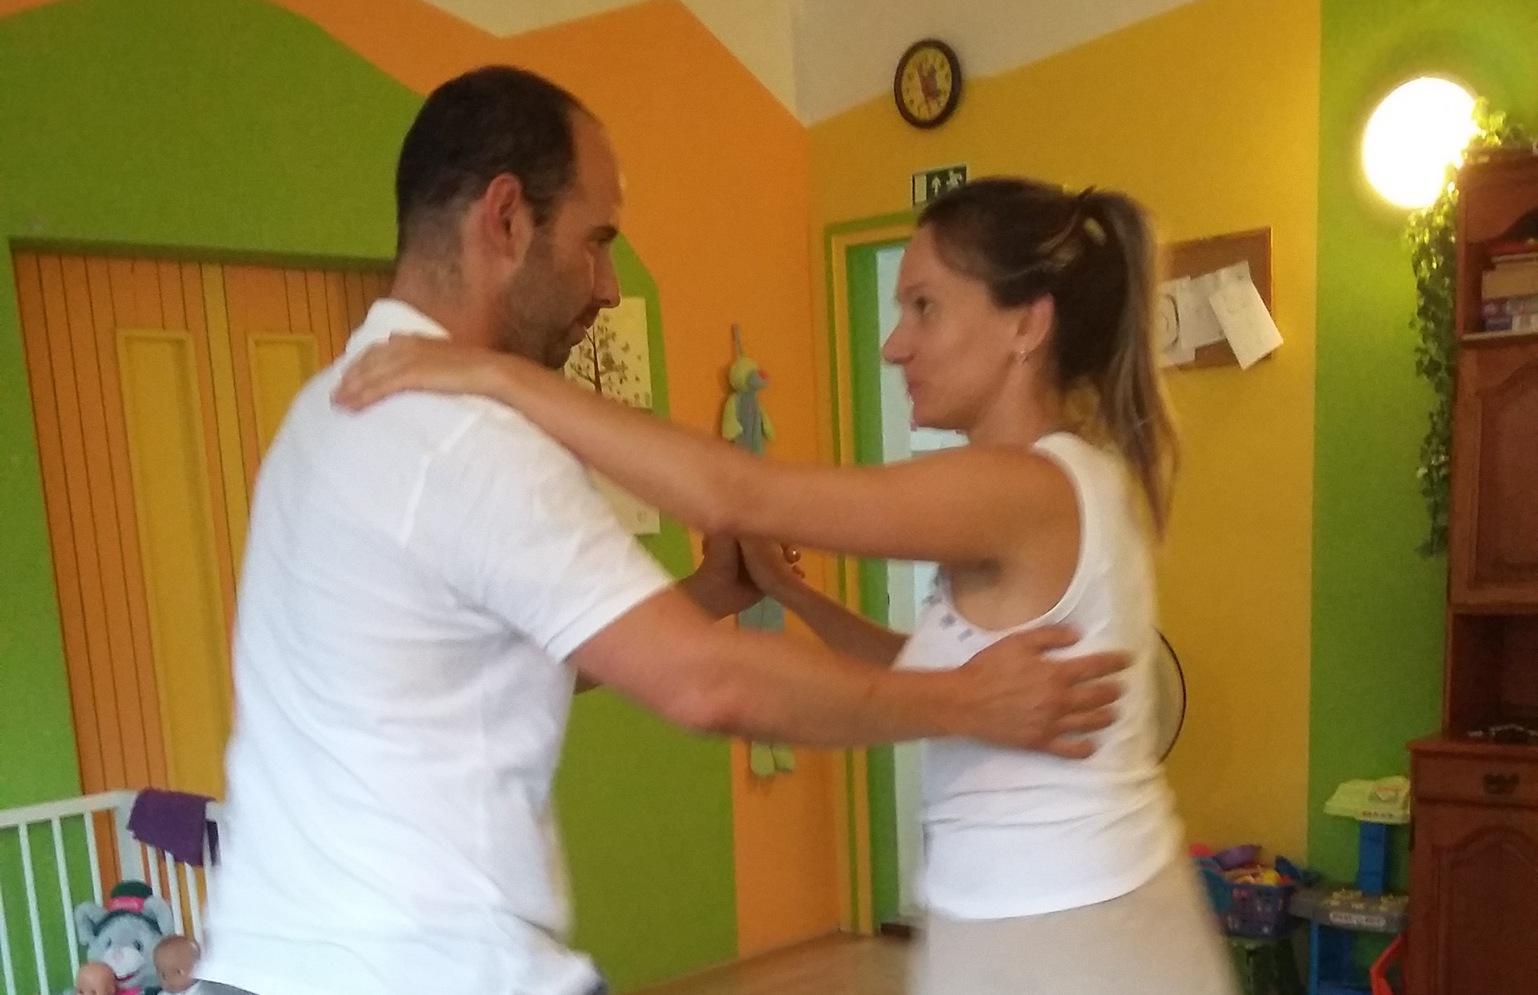 dsm_dance_saci-zsolti_vagott.jpg